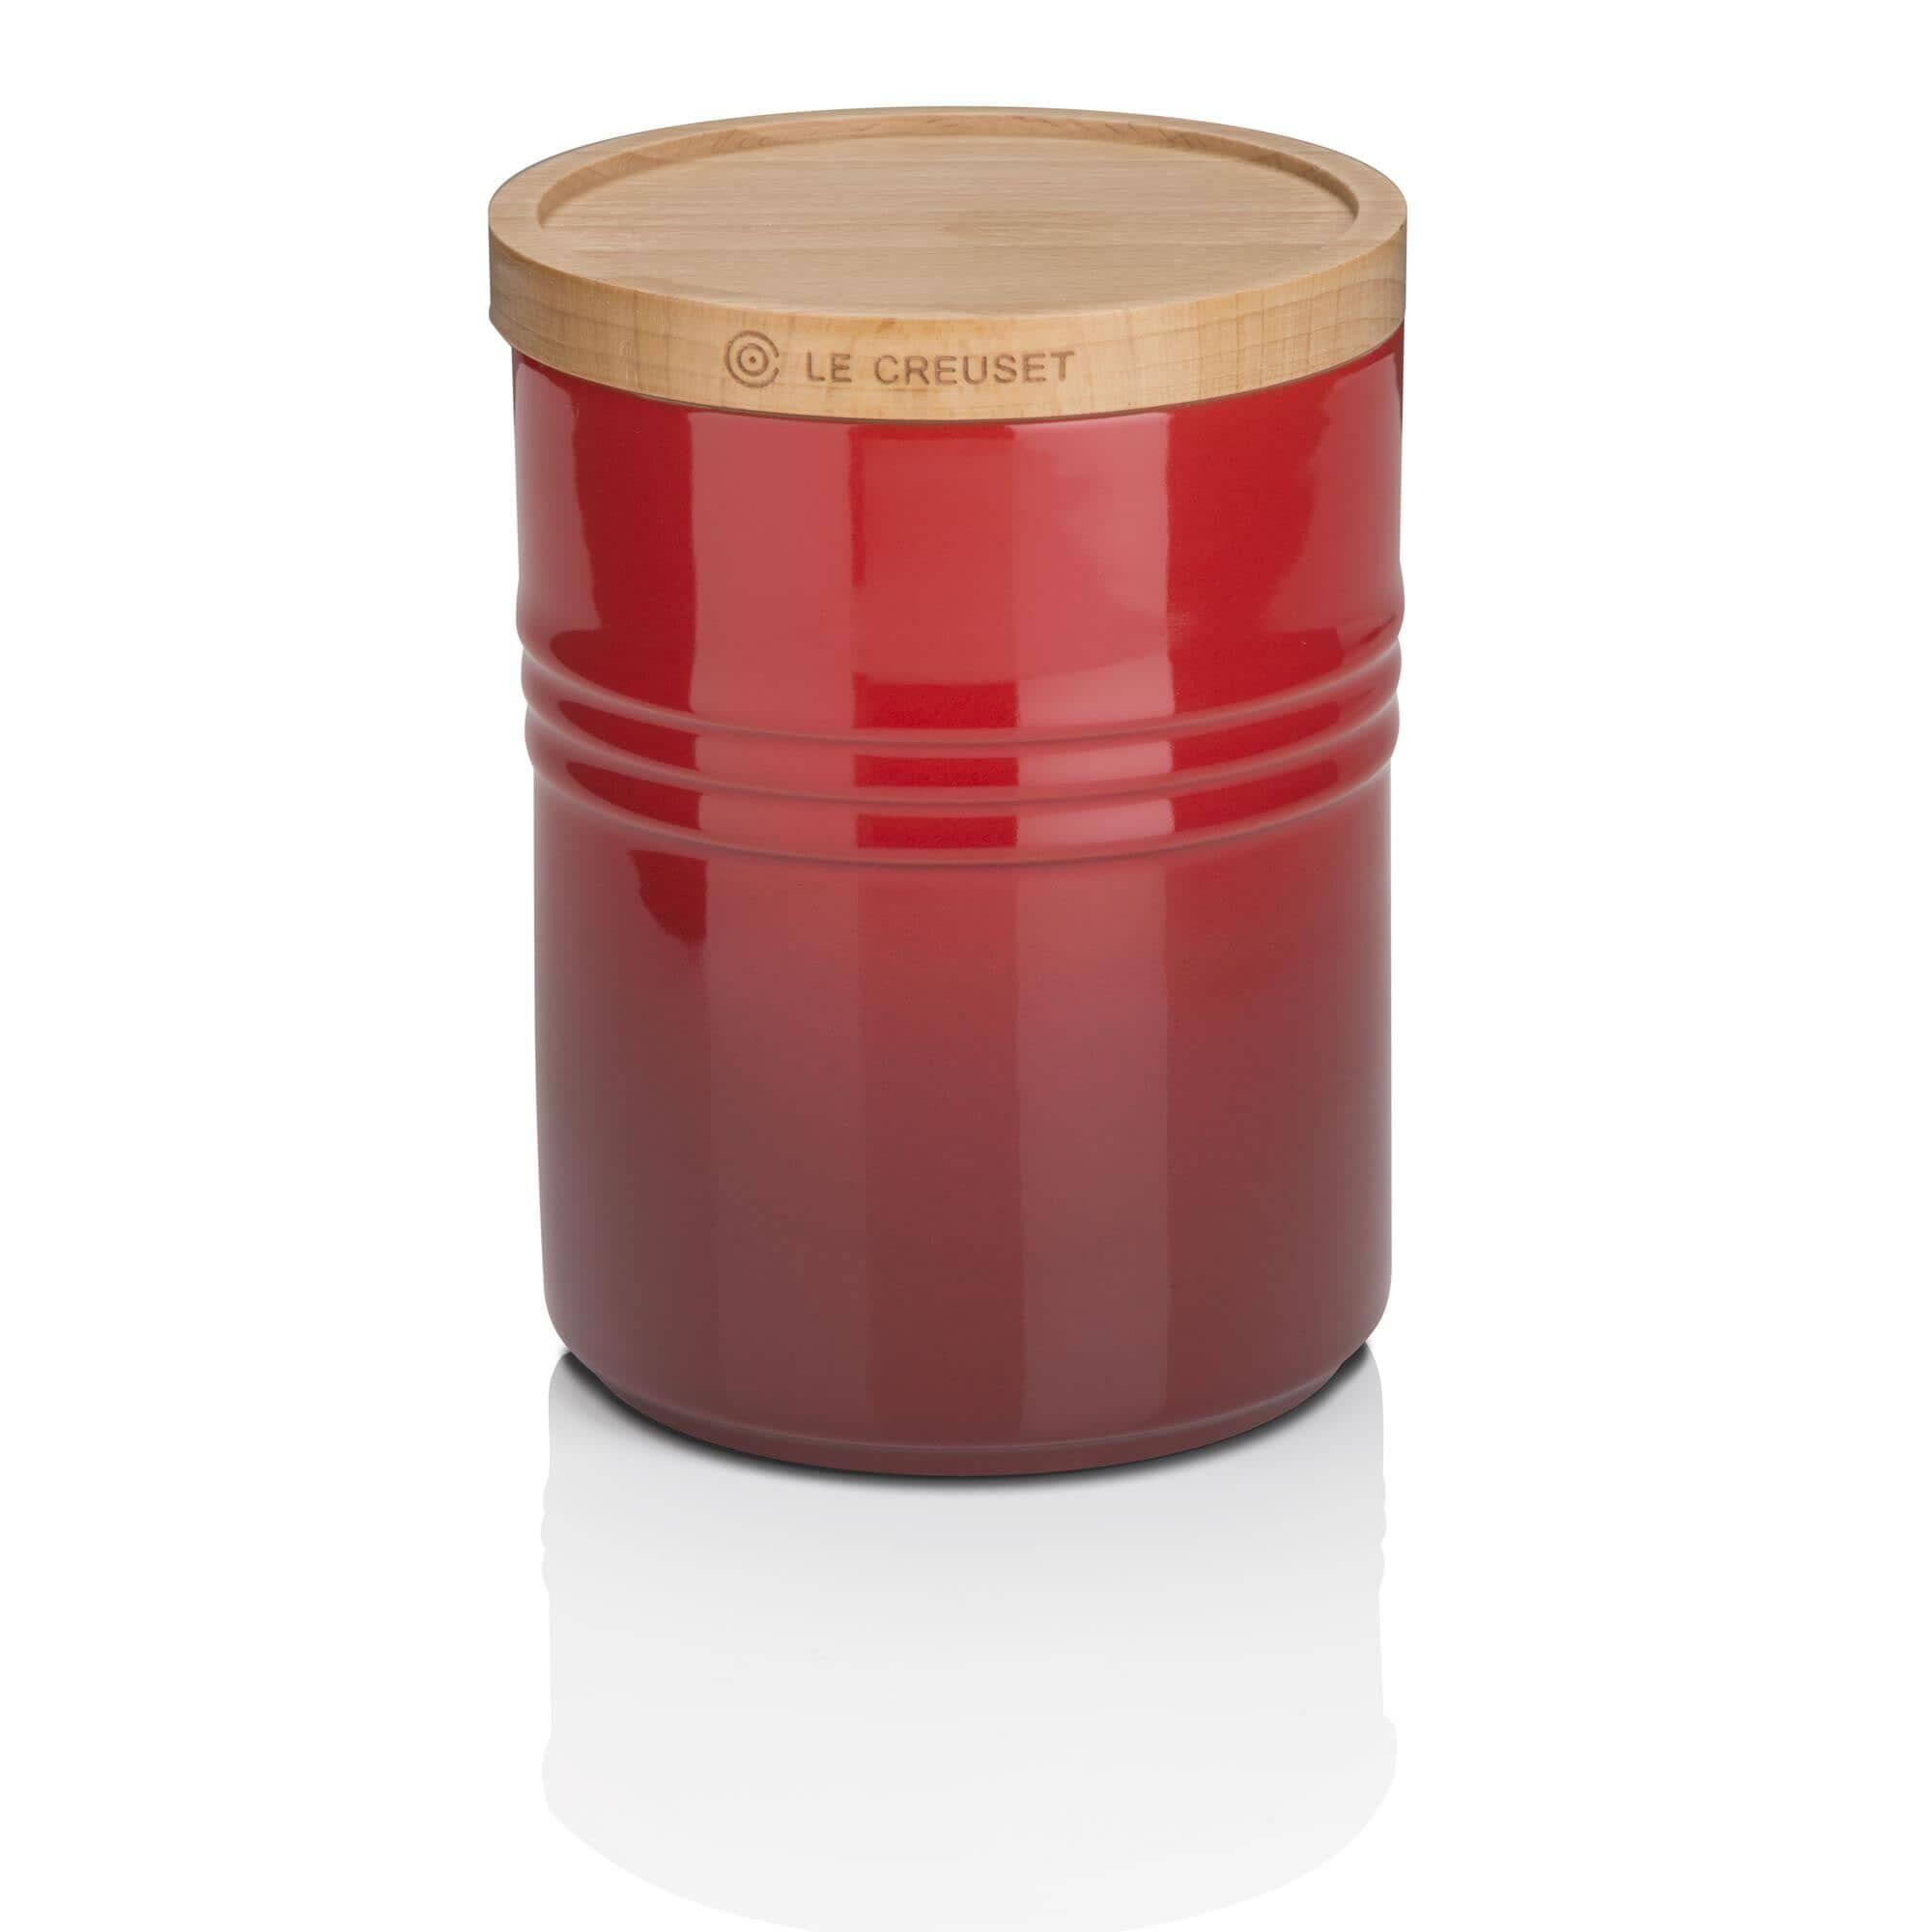 Le creuset new medium storage jar with wooden lid cerise